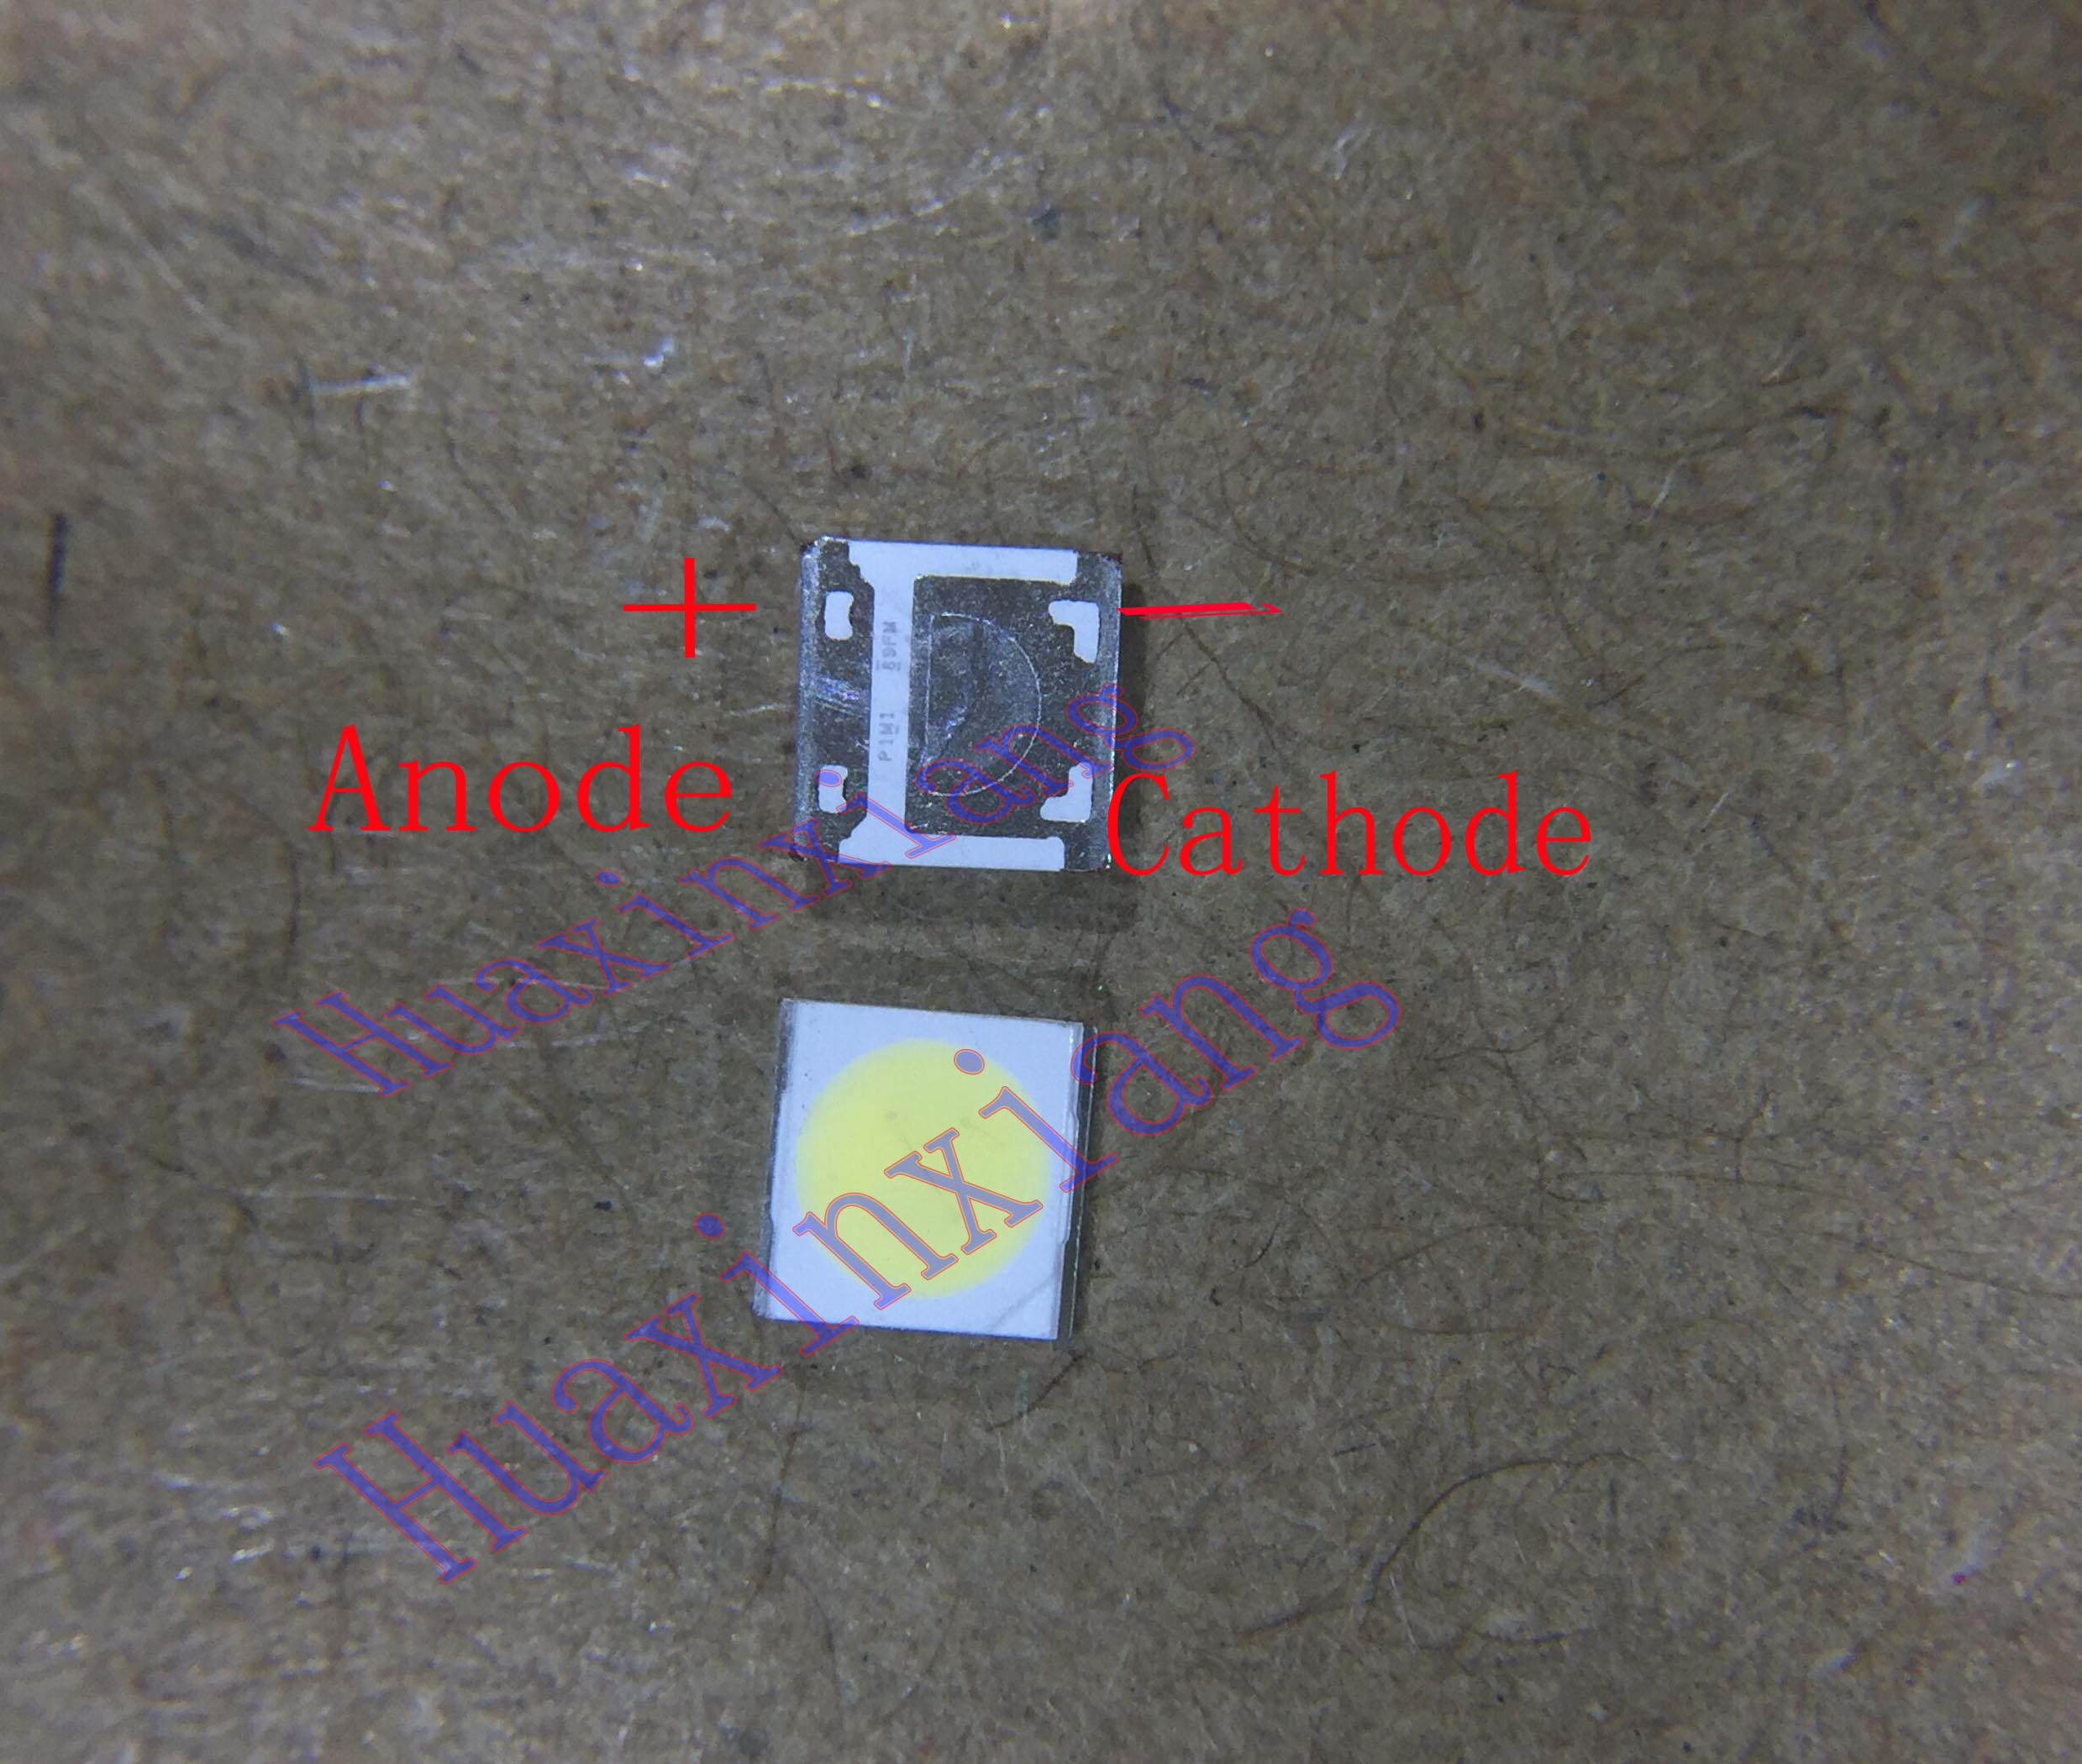 100PCS/Lot SMD LED 3535 6V 2W Cold White WM35E2F-YR09B-eA For Wooree LCD/TV Backlight Application